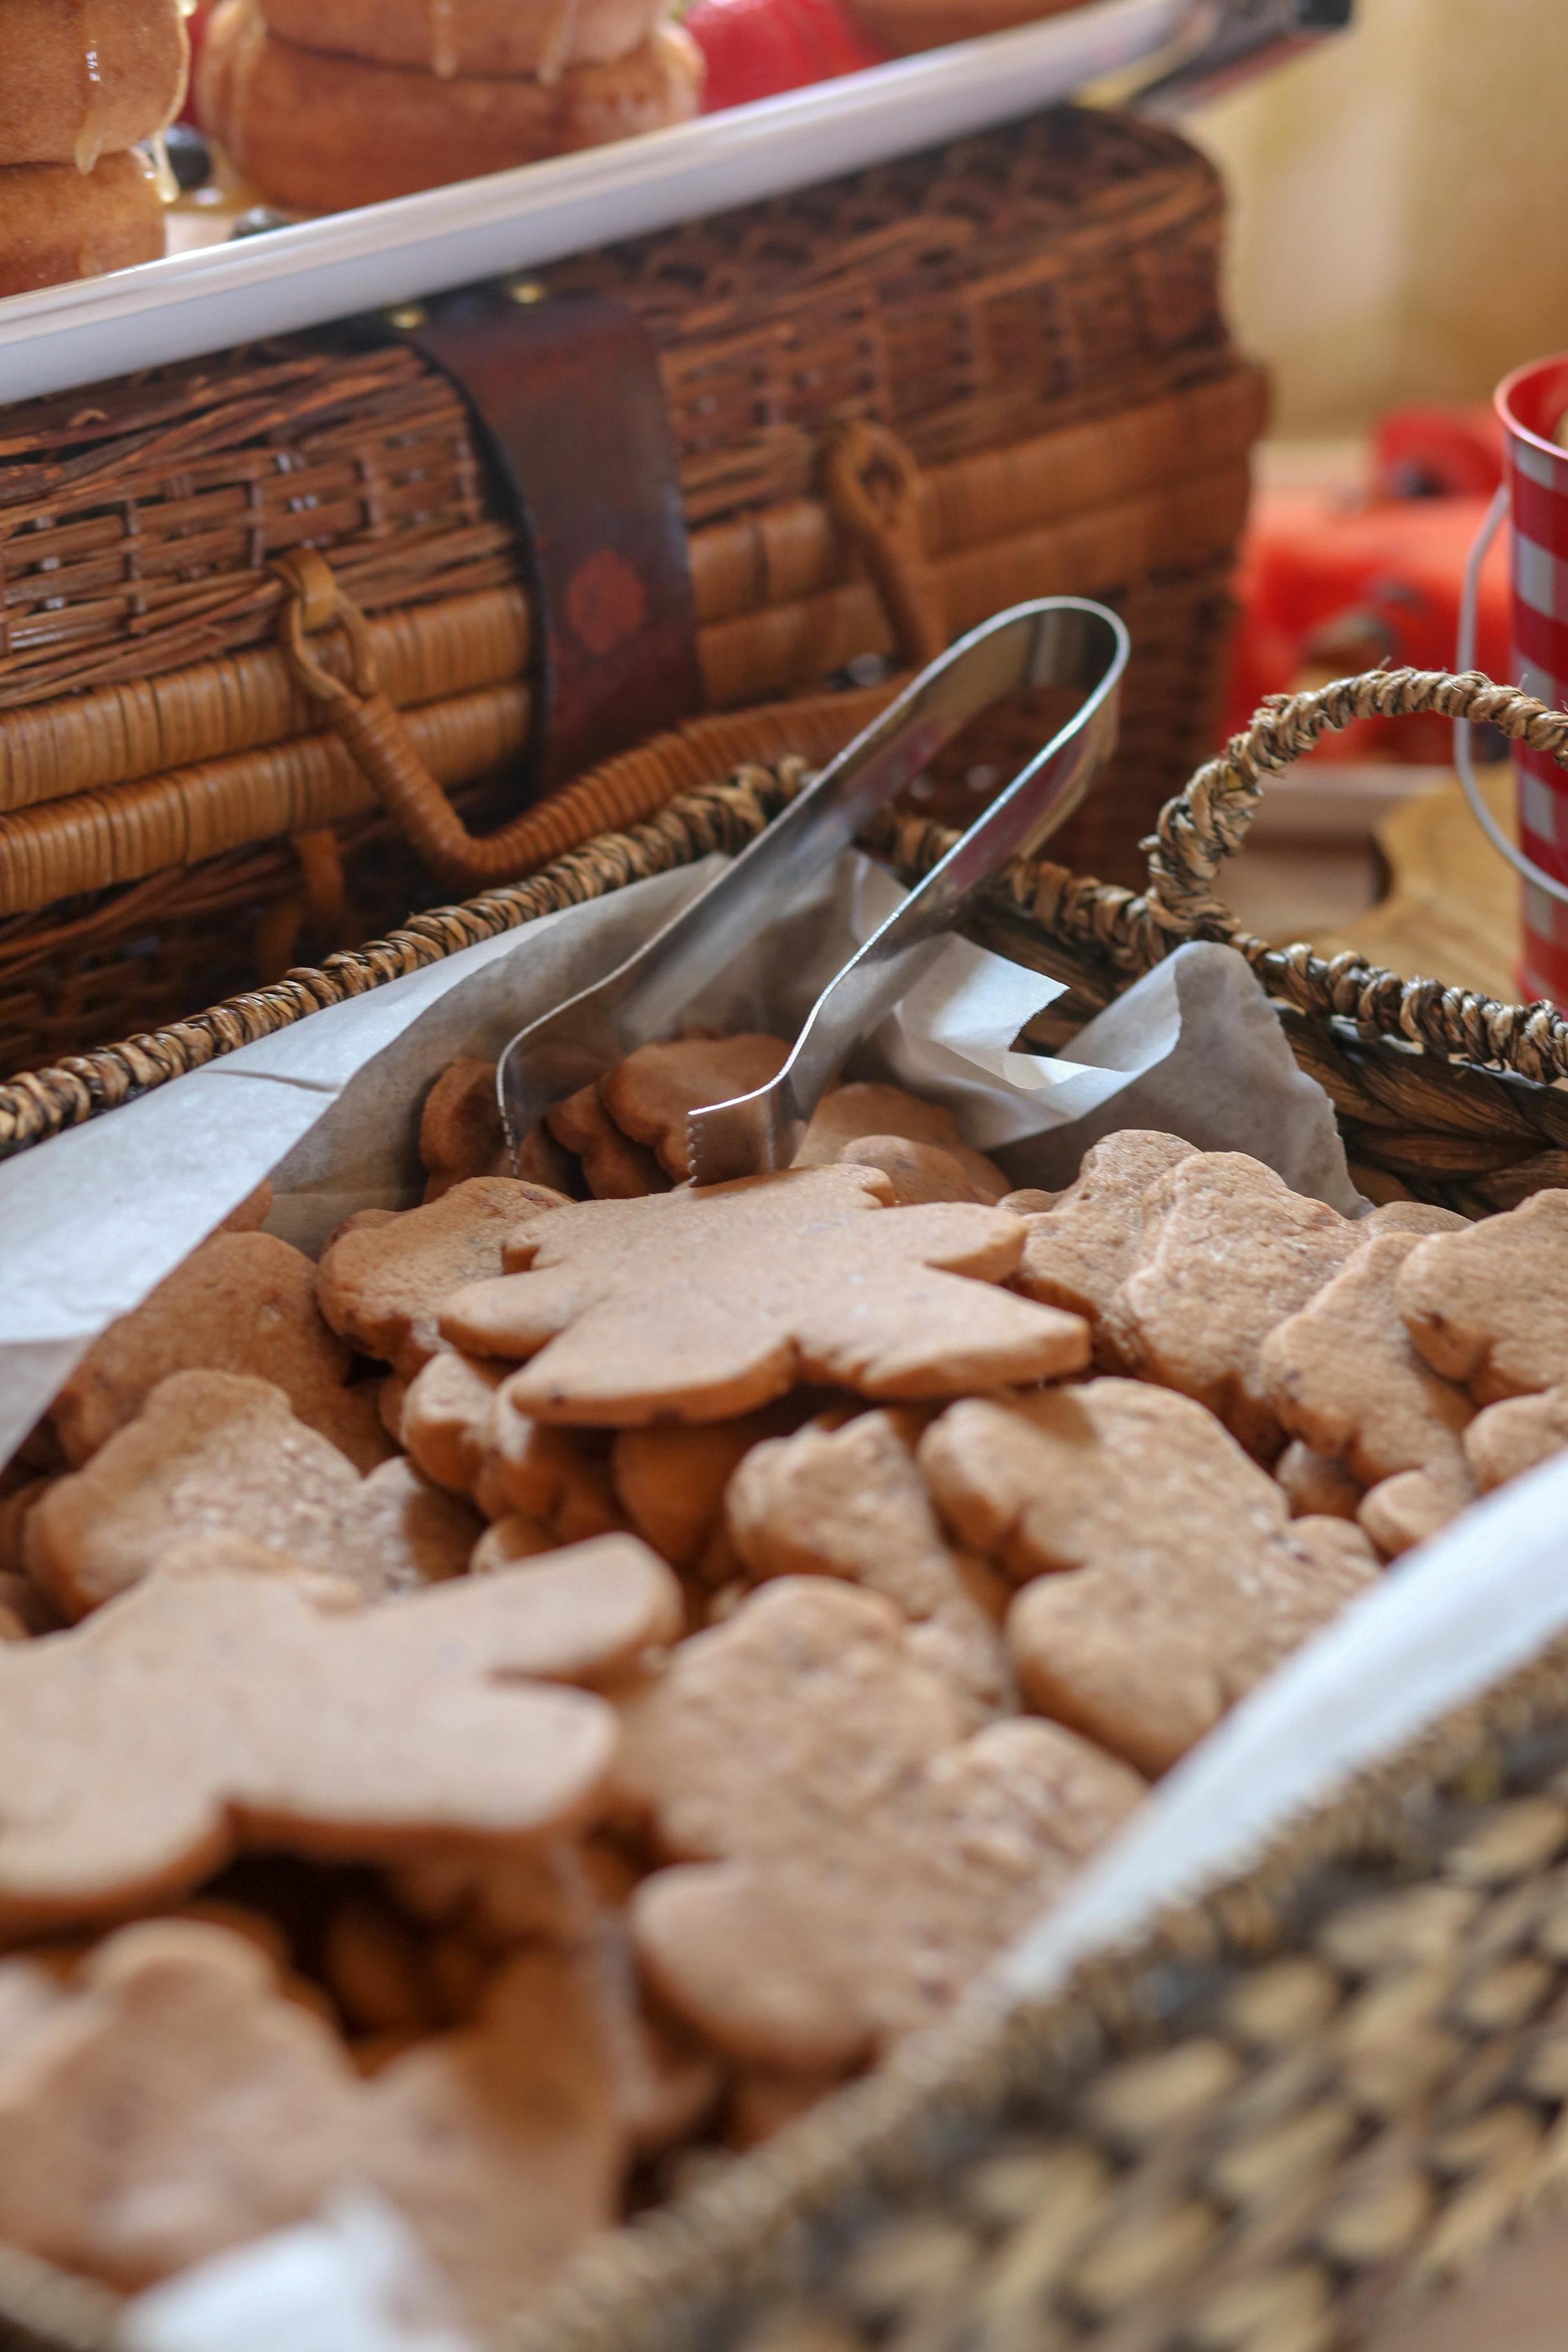 Rode's Catering cookies